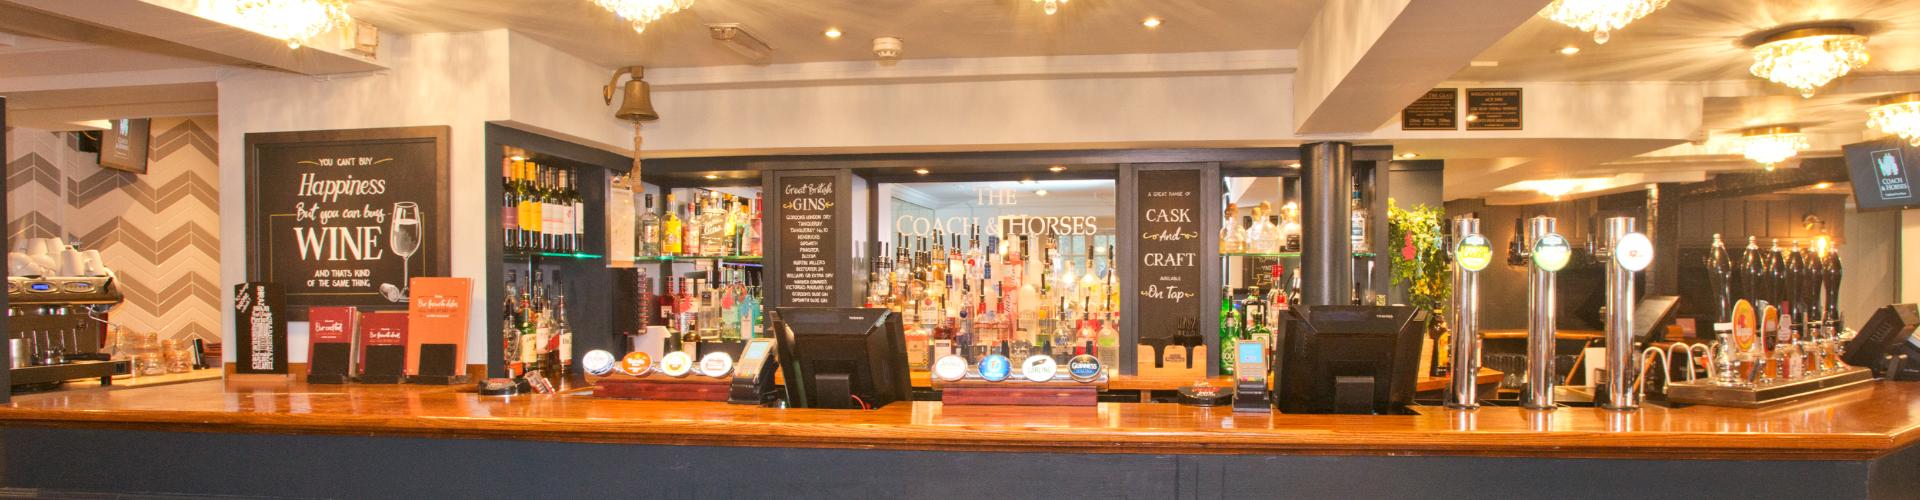 Coach Horses Traditional Country Pubs In Ickenham Uxbridge